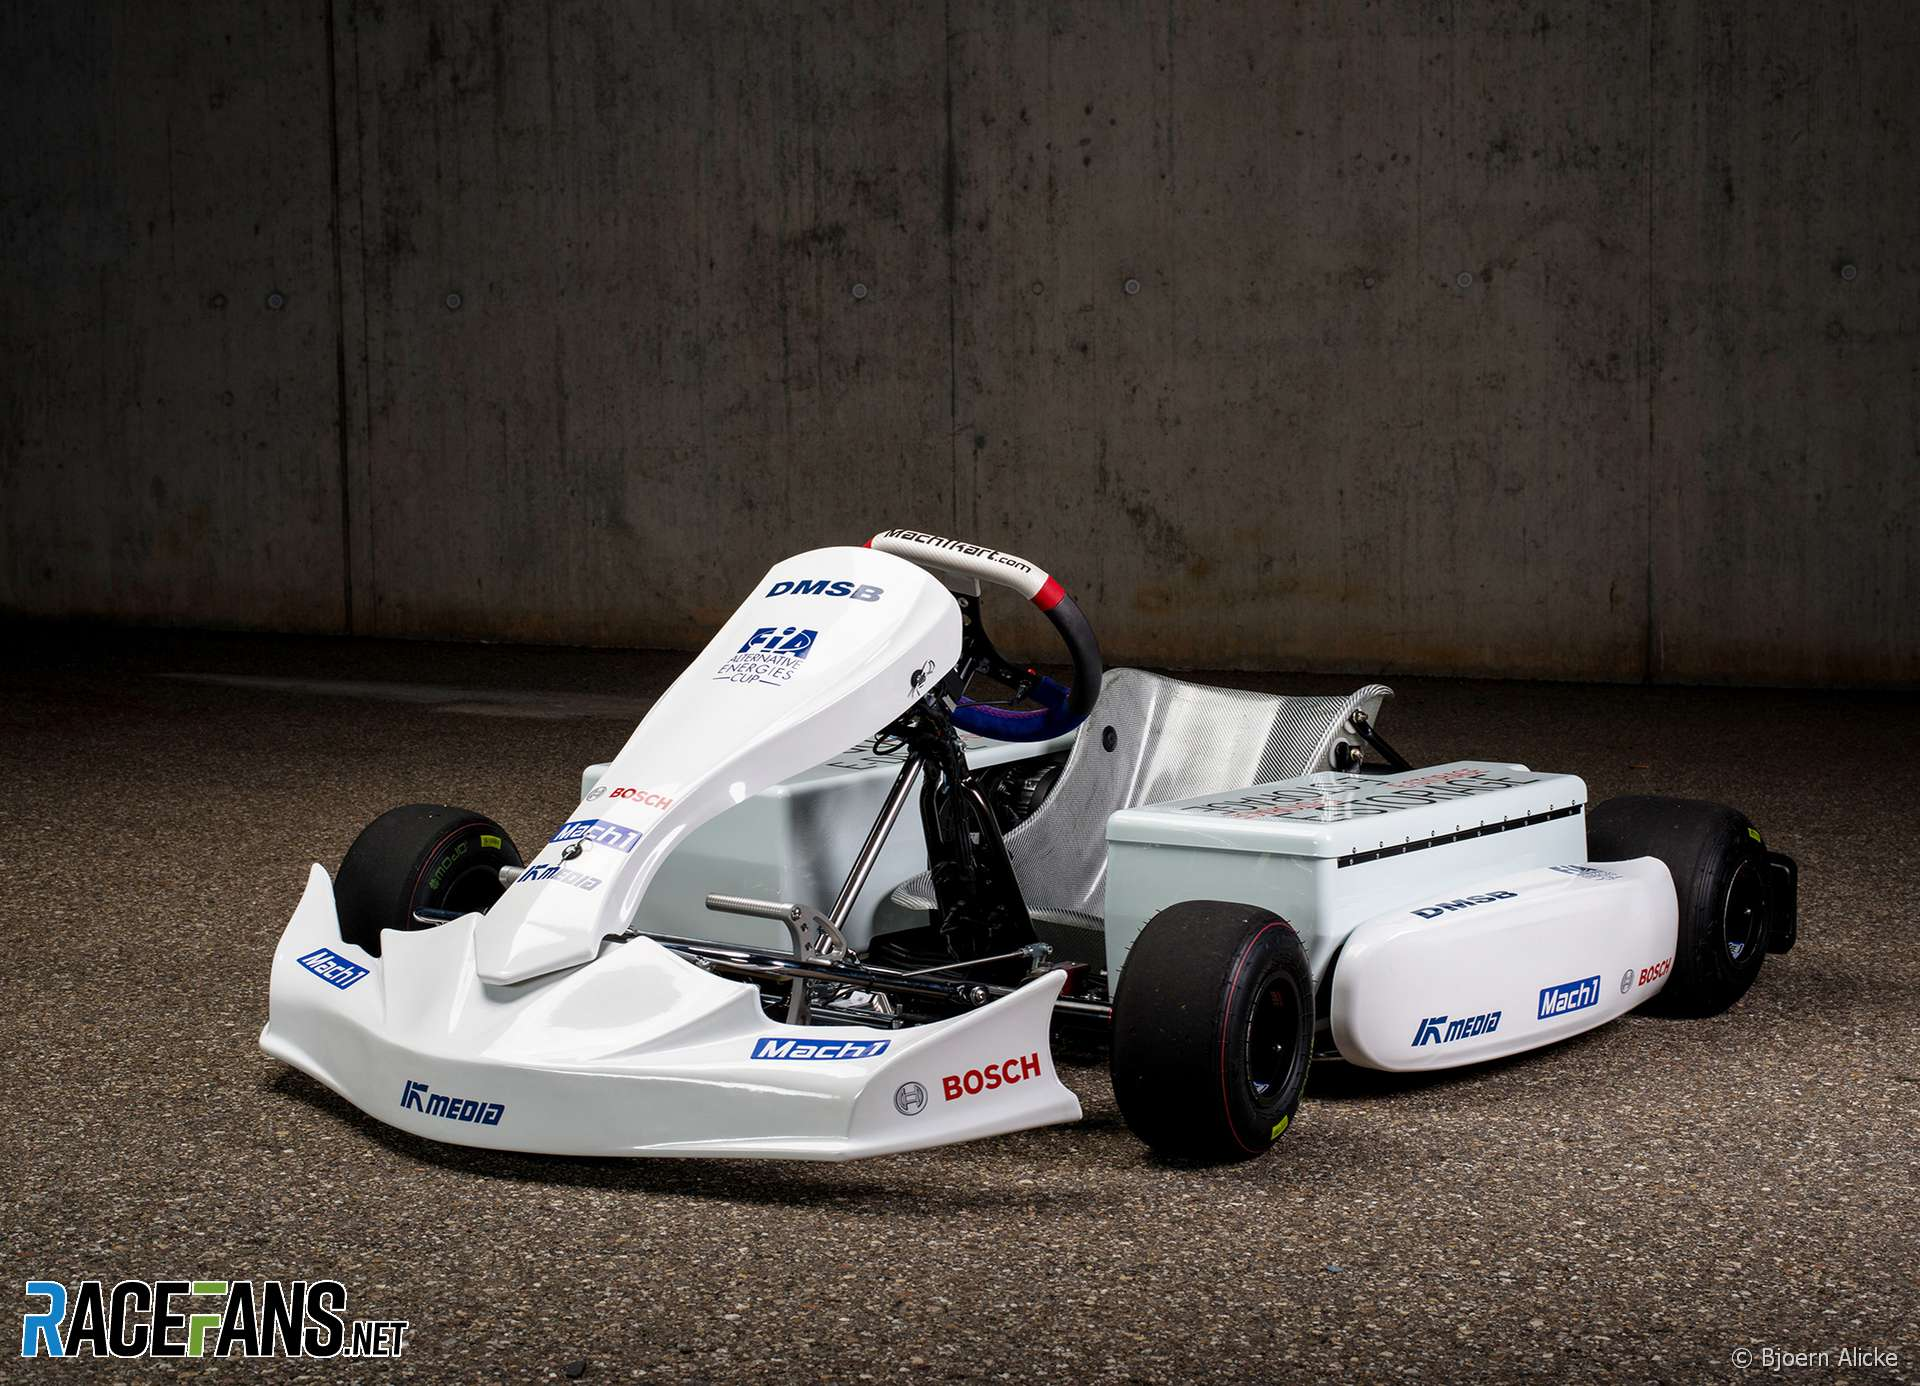 Mach1 electric kart